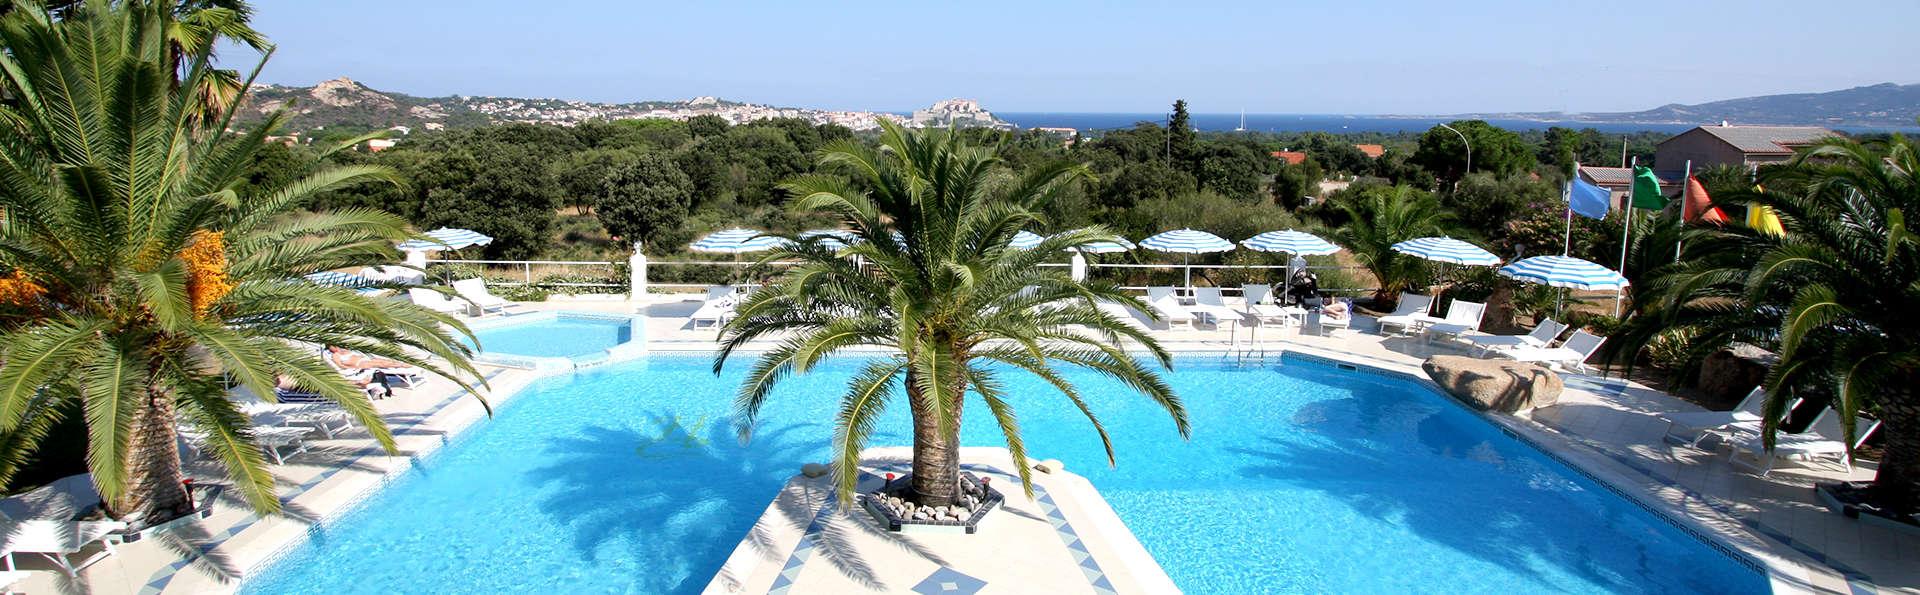 Hôtel Corsica - Edit_Pool.jpg